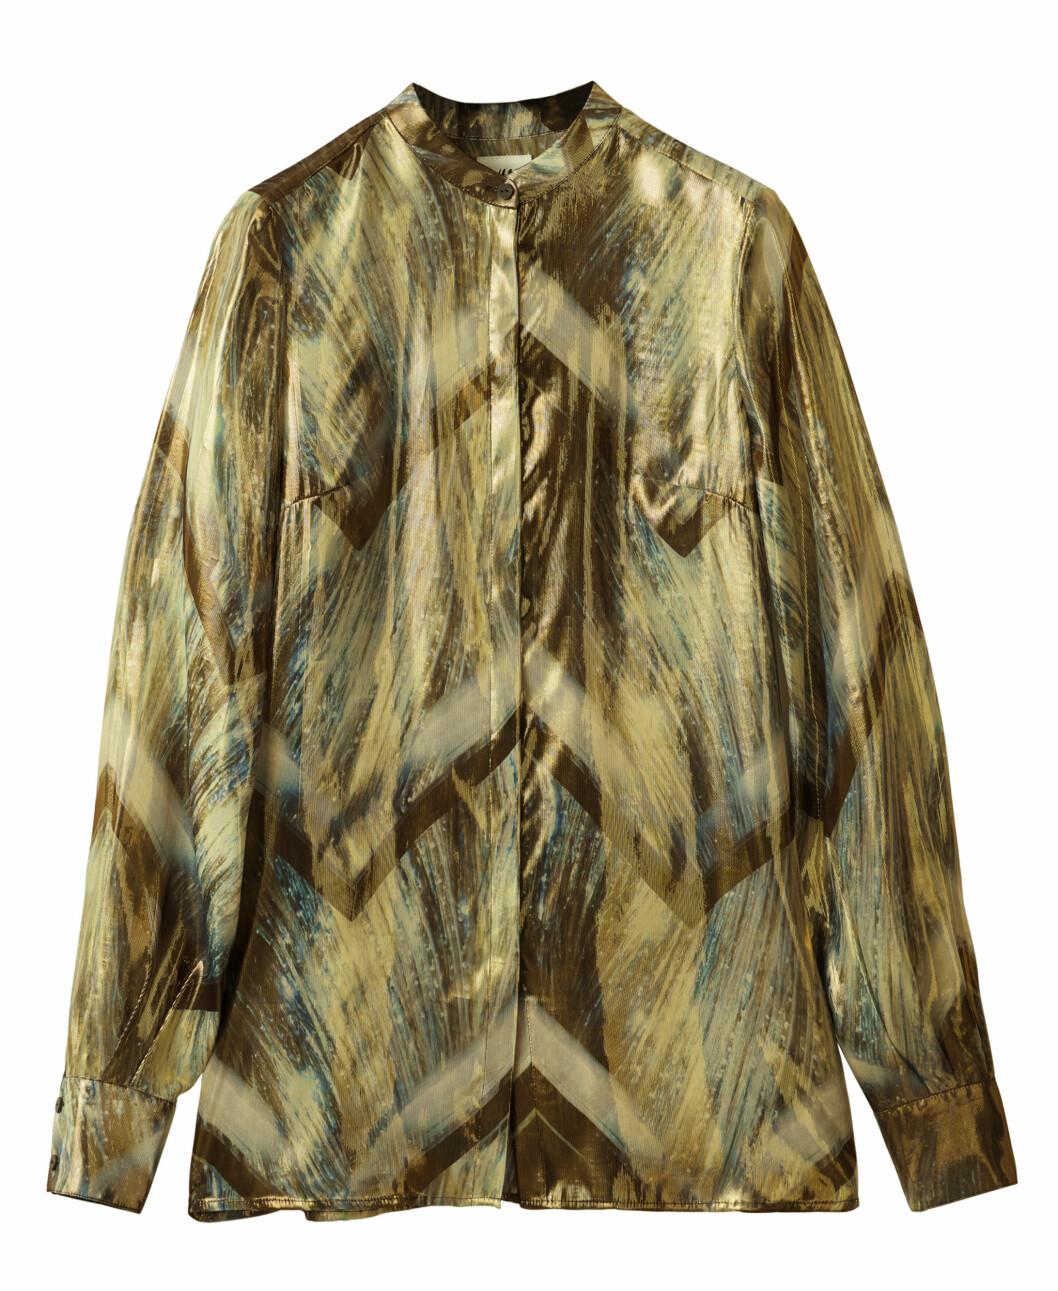 Bluse, kr 599. Foto: Produsenten